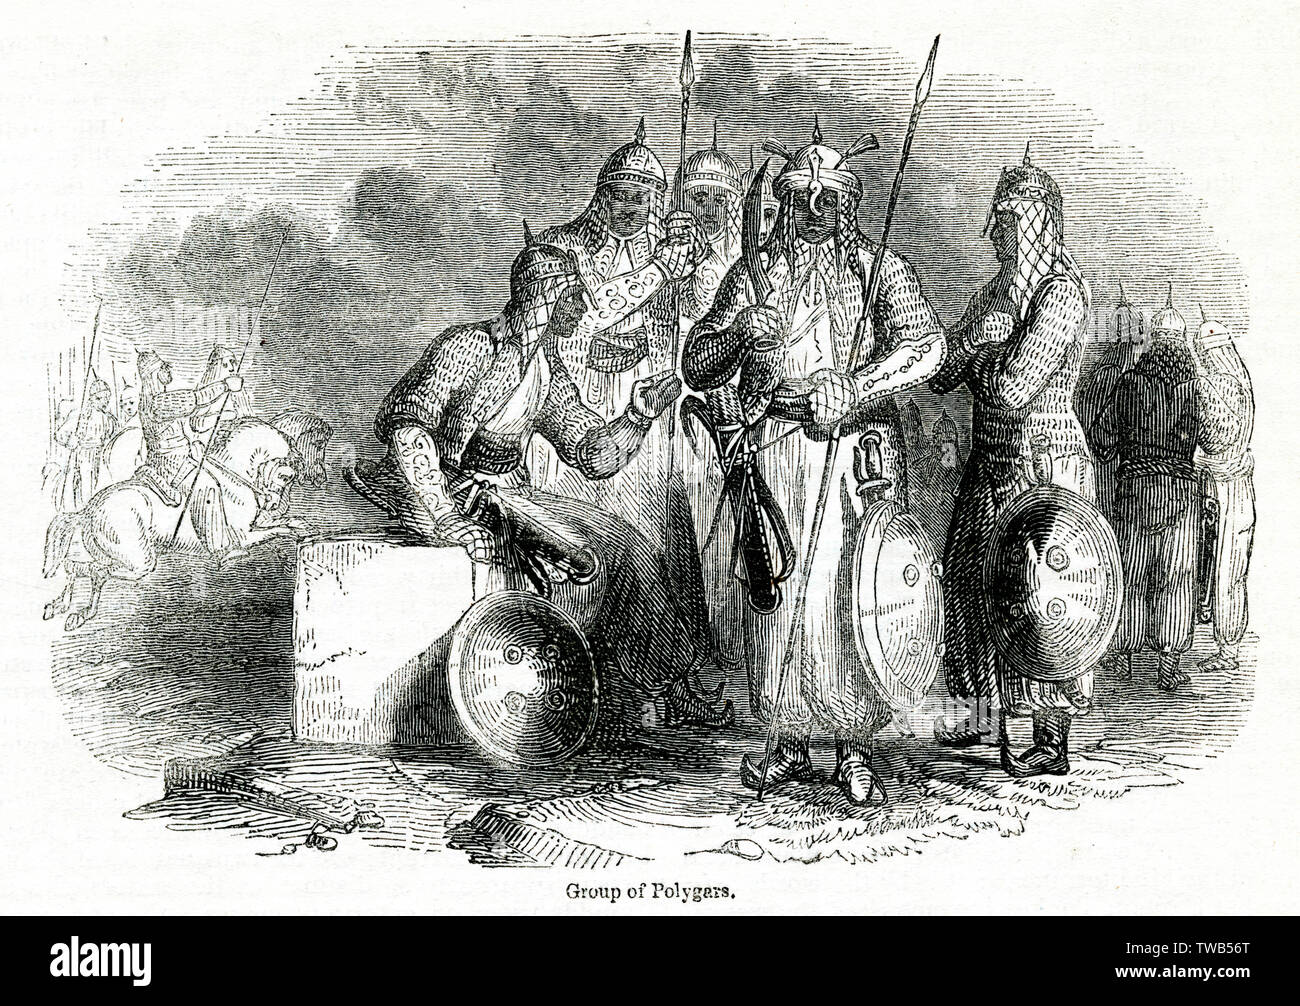 (Polygars Palaiyakkarars, militärischer Leiter) Der Tinnevelly (tirunelveli), Tamil Nadu (Madras), Südindien. Datum: 1842 Stockfoto